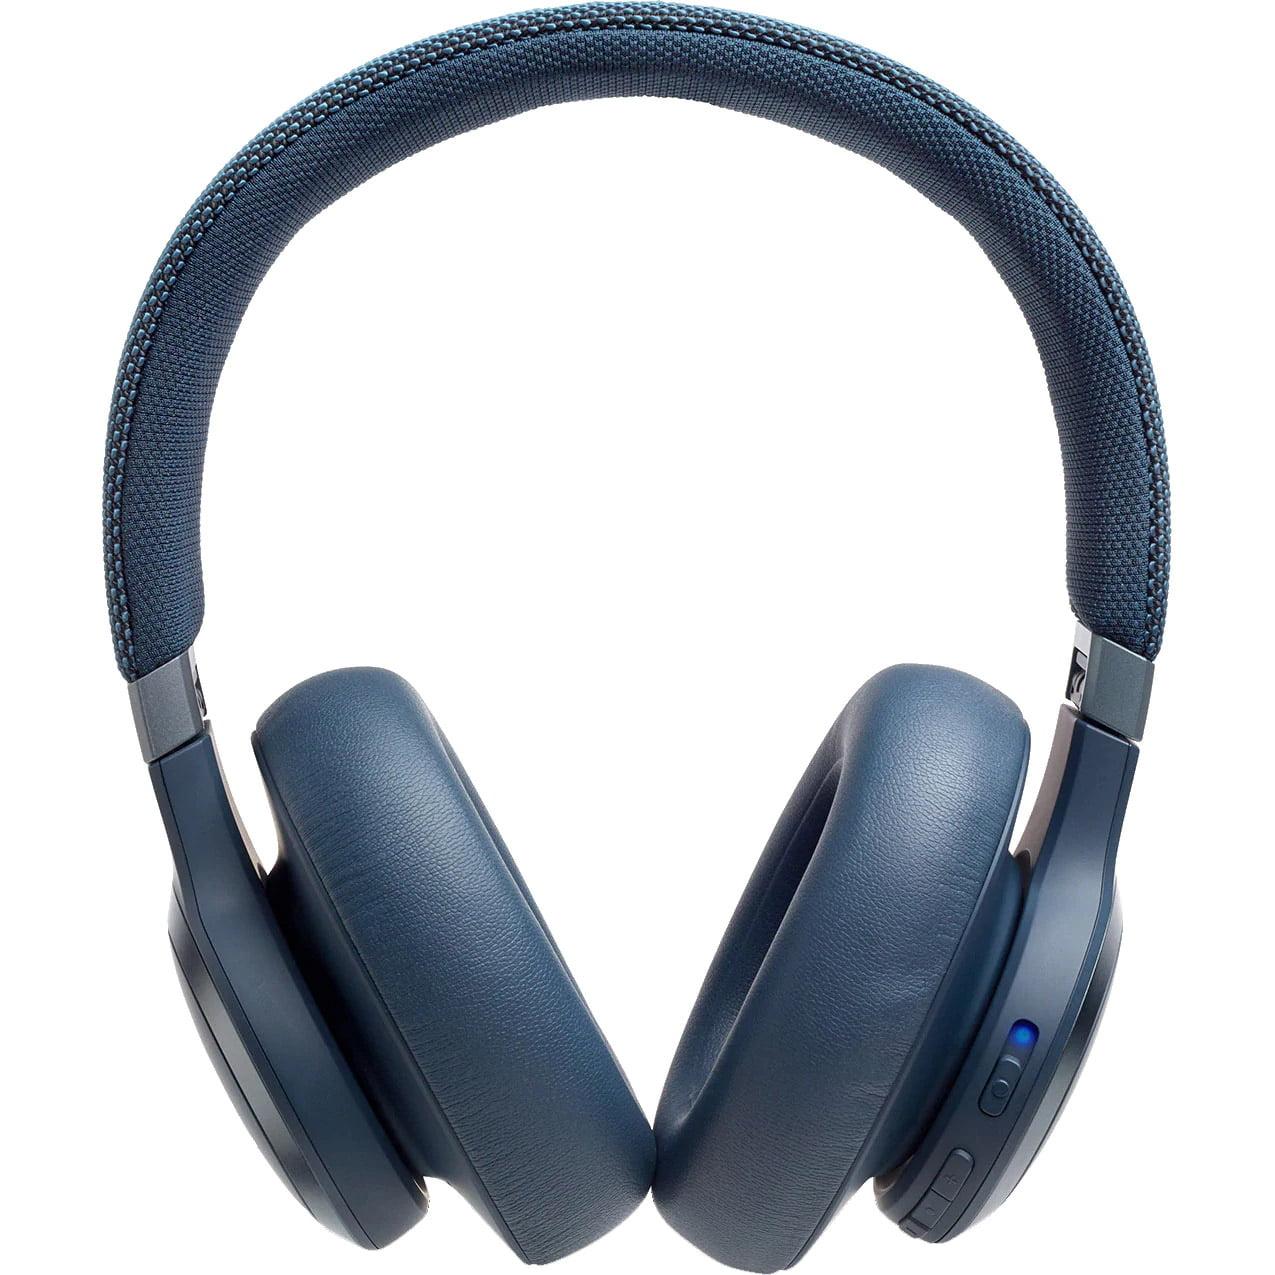 Casti audio Over-Ear JBL Live 650BTNC, Wireless, Bluetooth, JBL Signature Sound, Noise Cancelling, TalkThru Technology, 30h, Blue